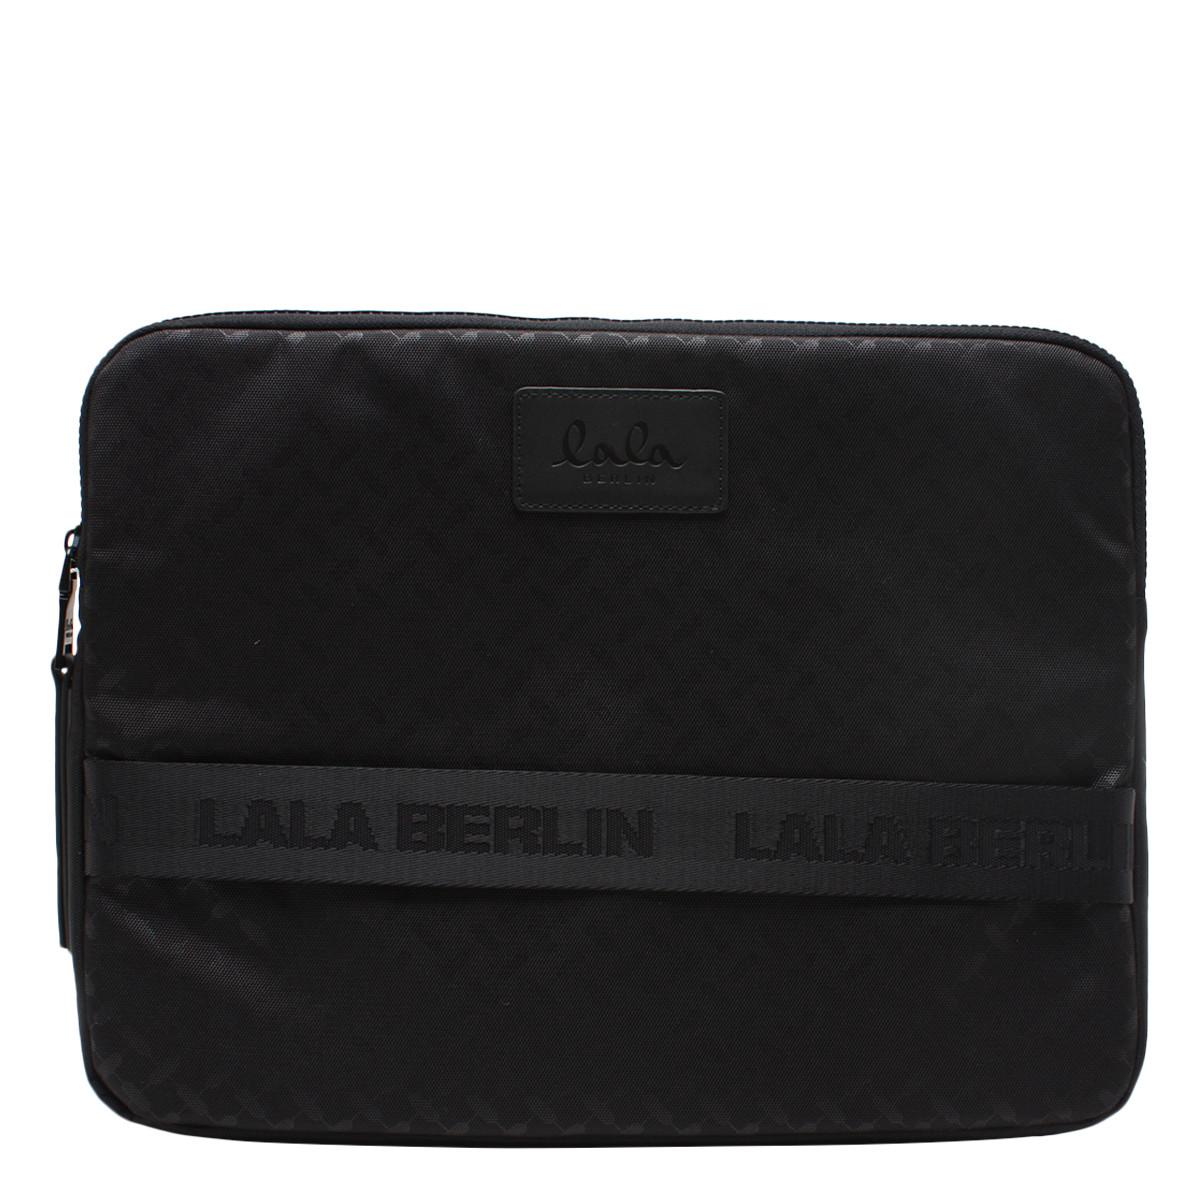 LALA BERLIN TASKE - LAPTOP CASE KIRSTEN CLASSIC BLACK